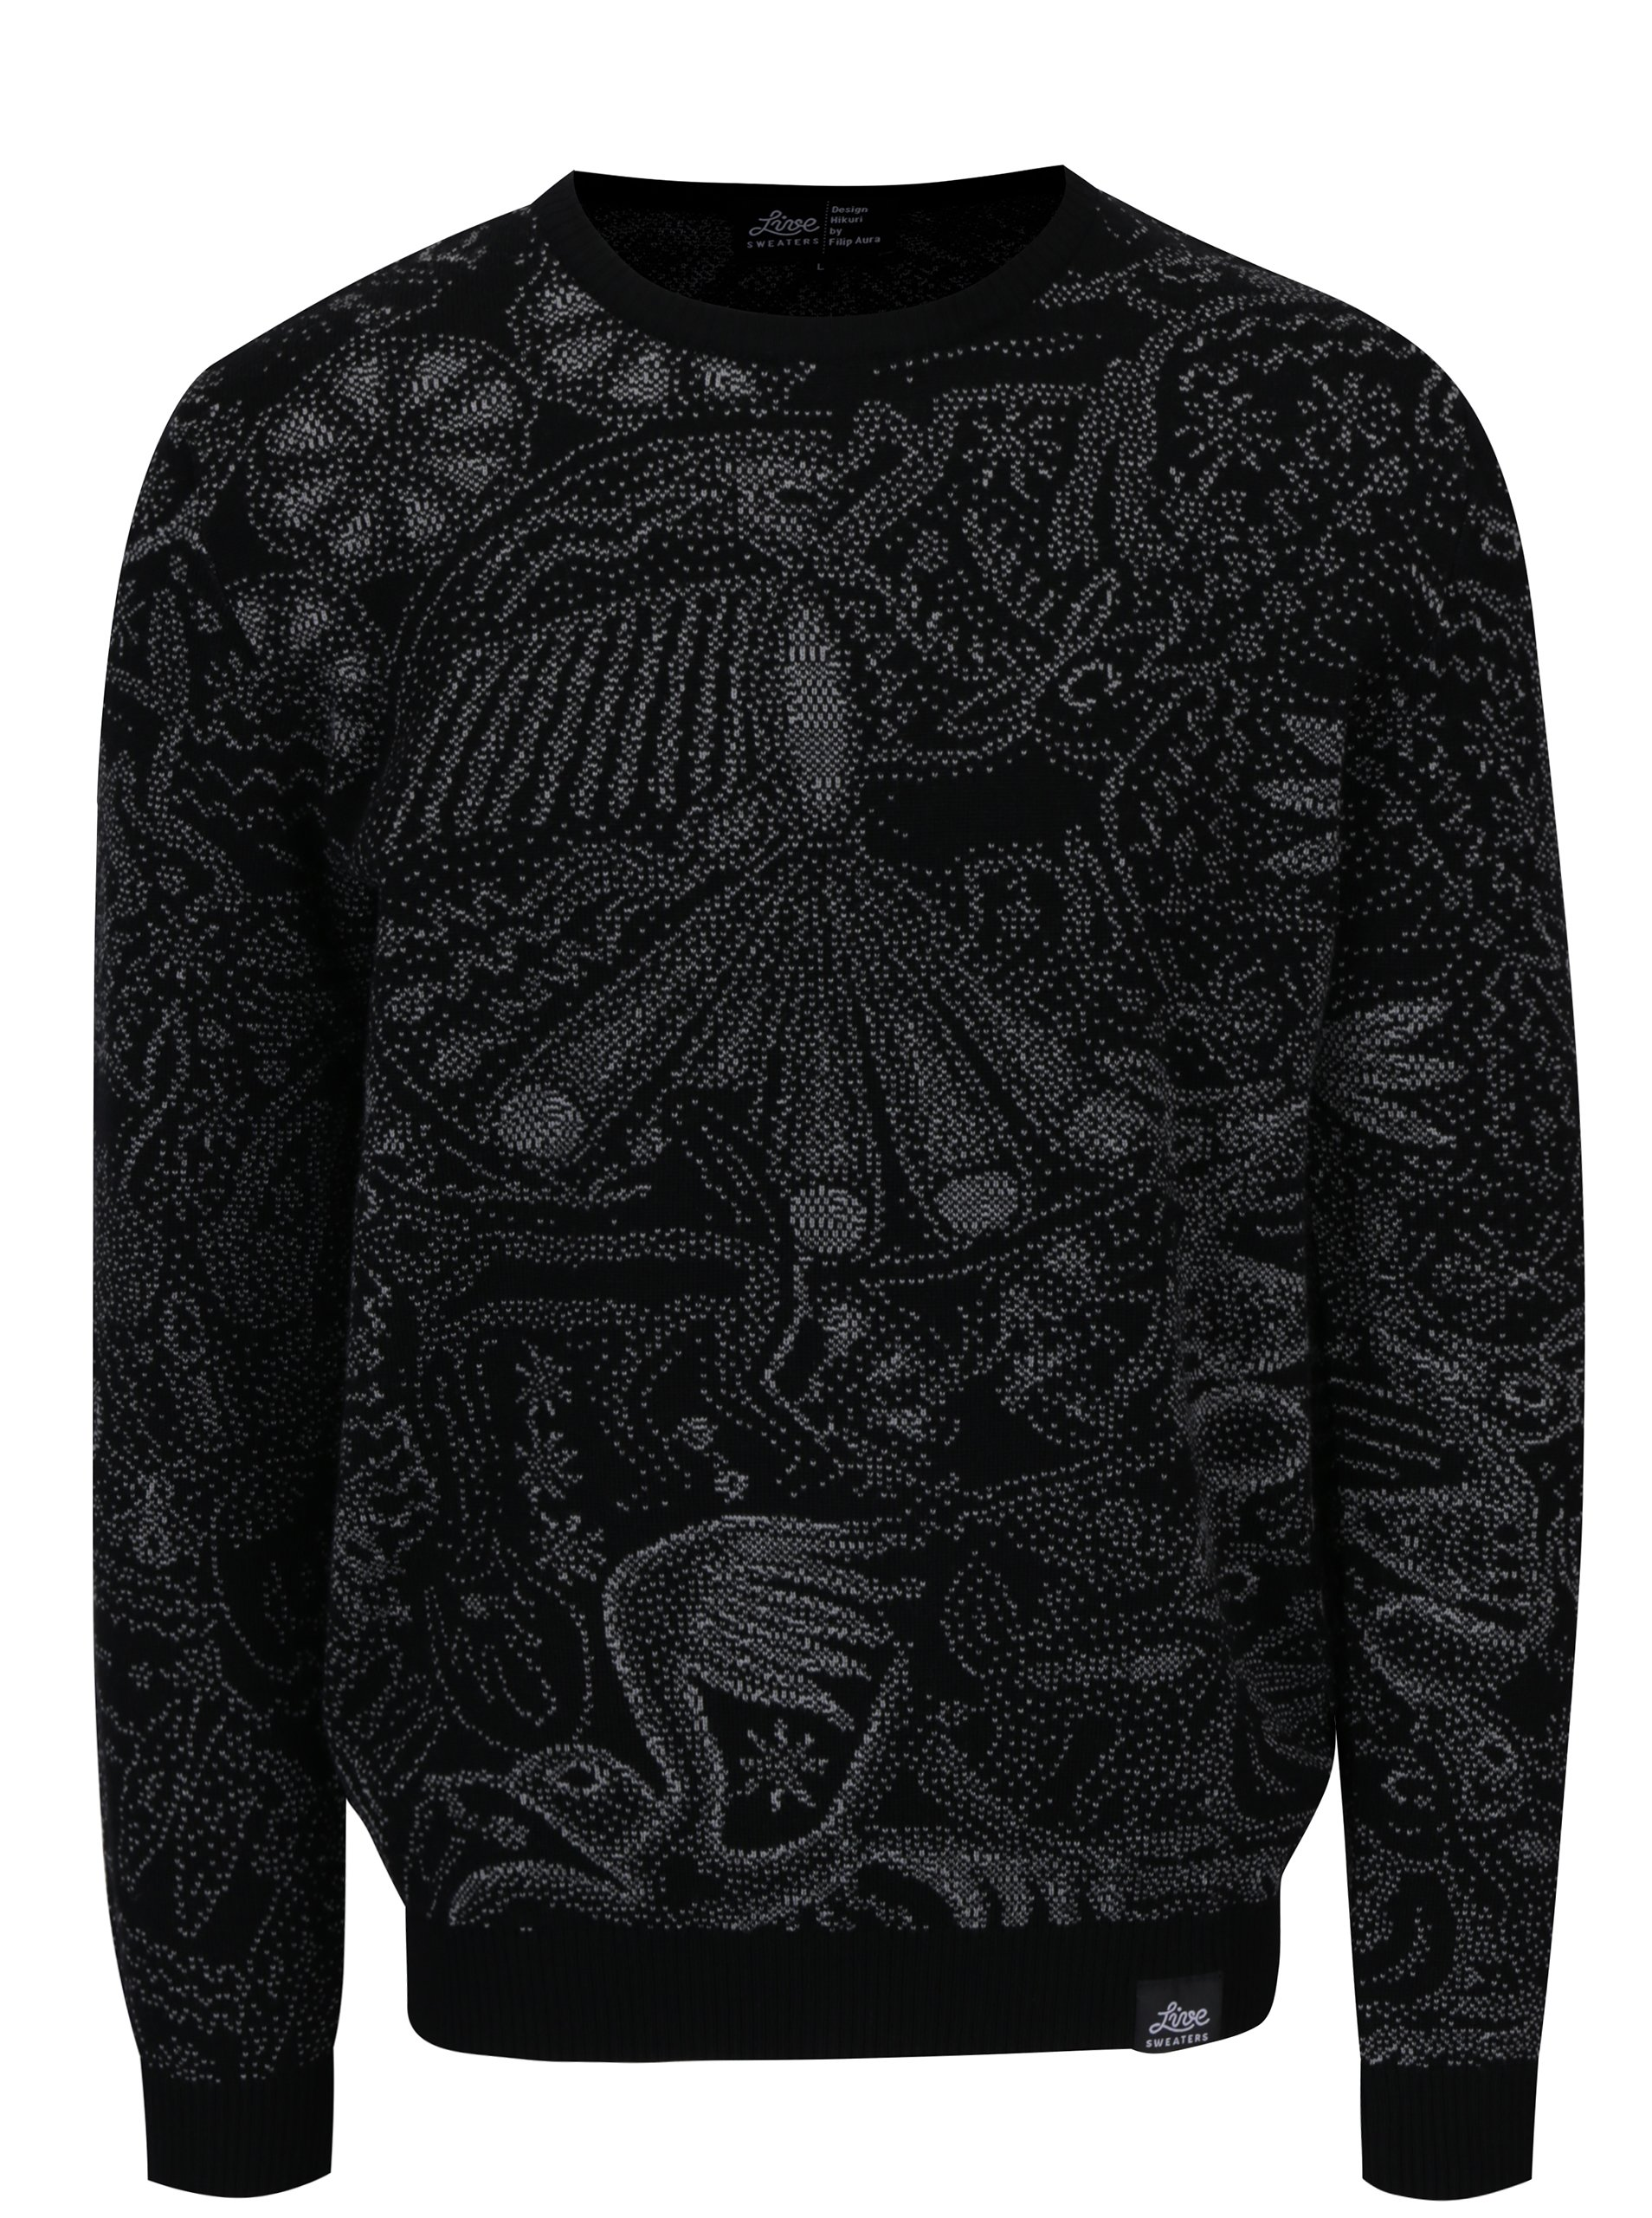 Šedo-černý svetr z merino vlny Live Sweaters Hikuri